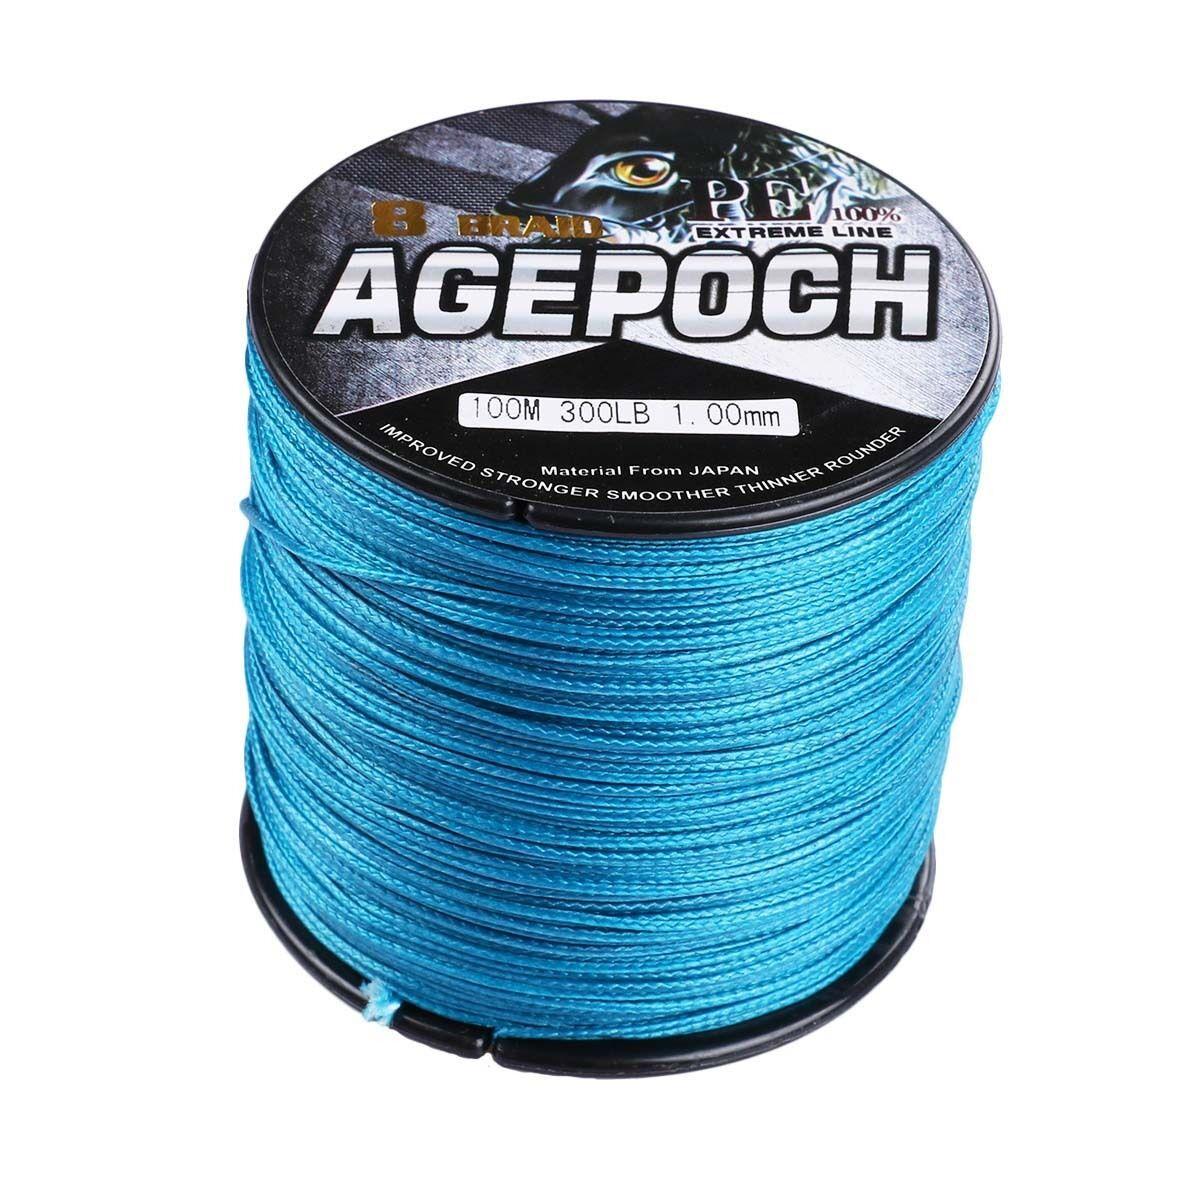 Agepoch 100M-2000M bluee 6LB-300LB Super Strong Dyneema Braided Fishing Line   low-key luxury connotation